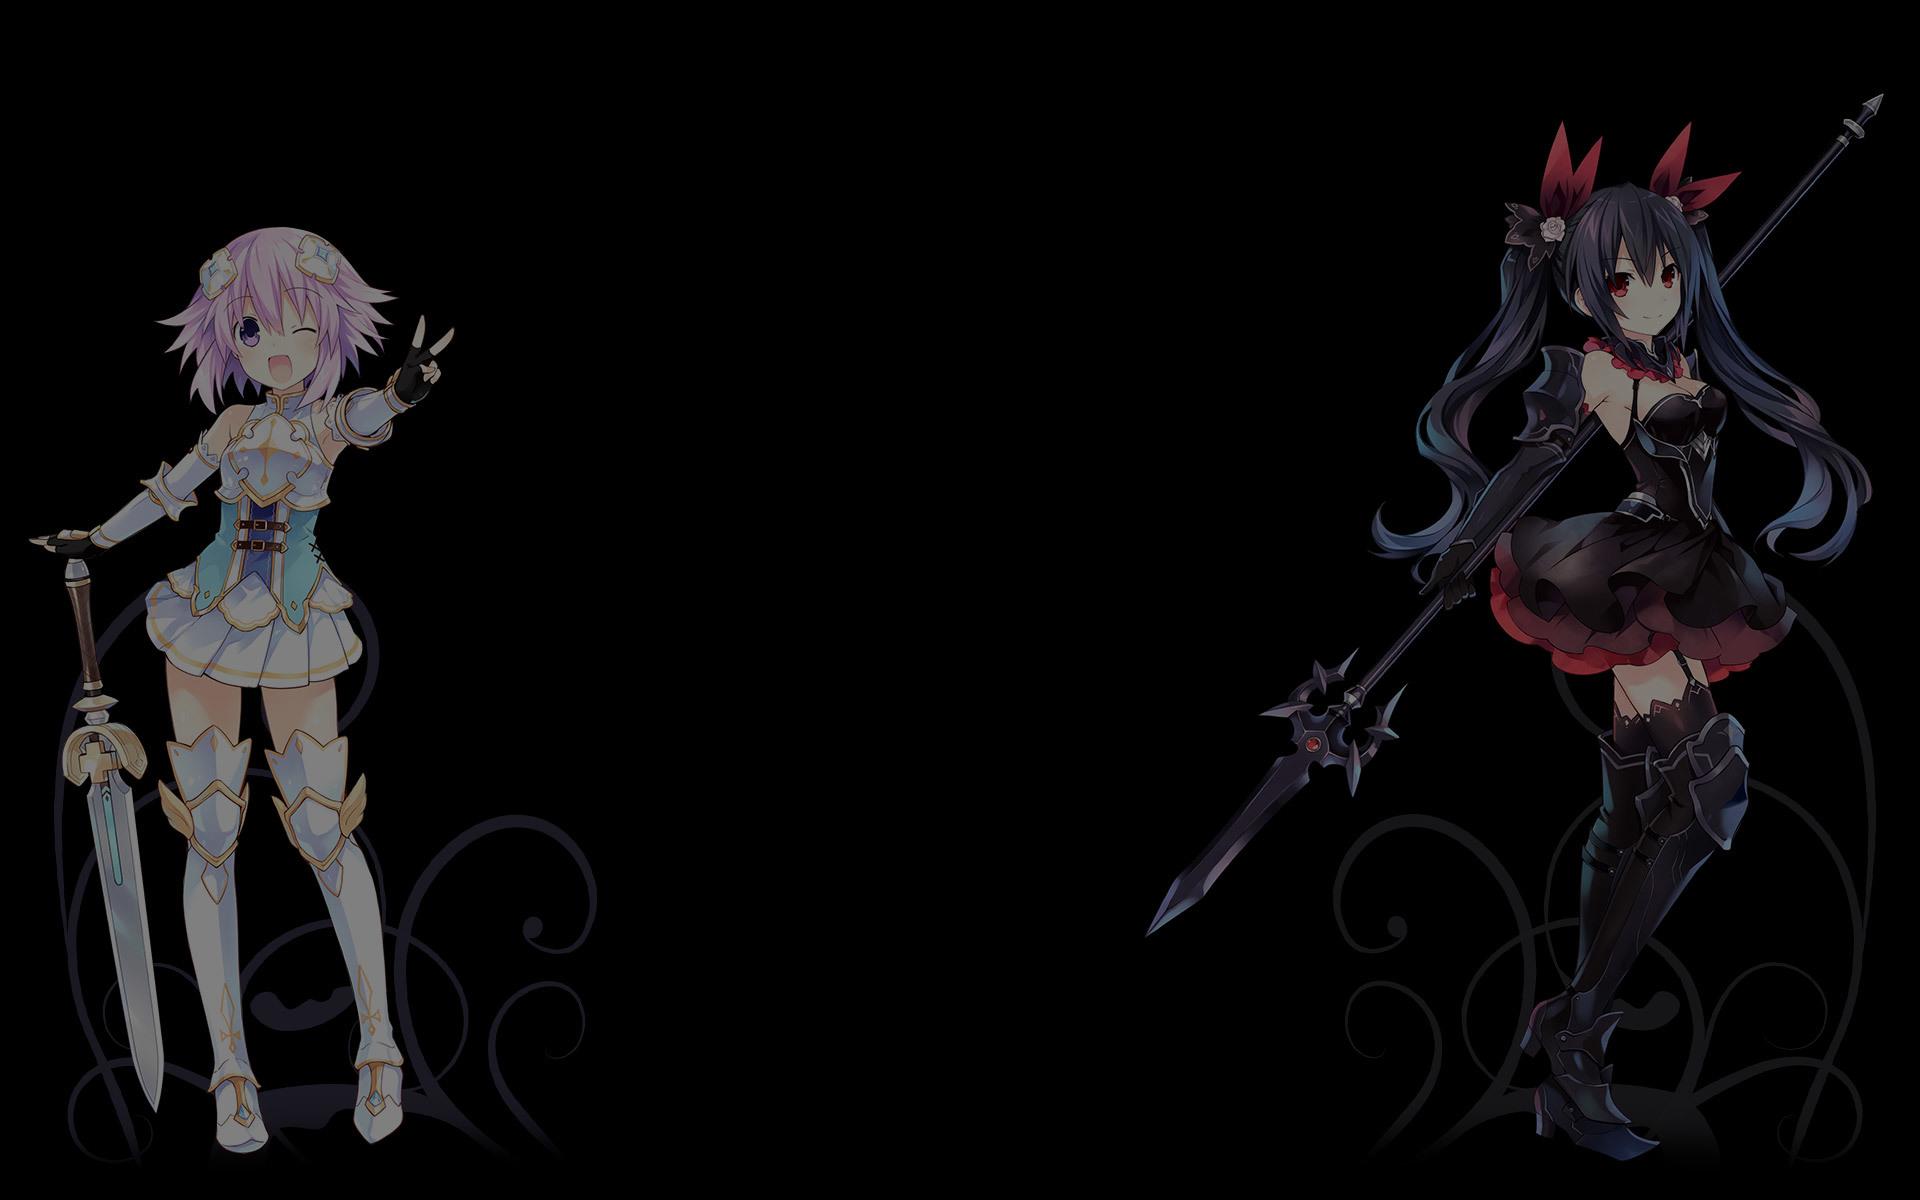 Cyberdimension Neptunia 4 Goddesses Online Wallpaper 002 Neptune and Noire